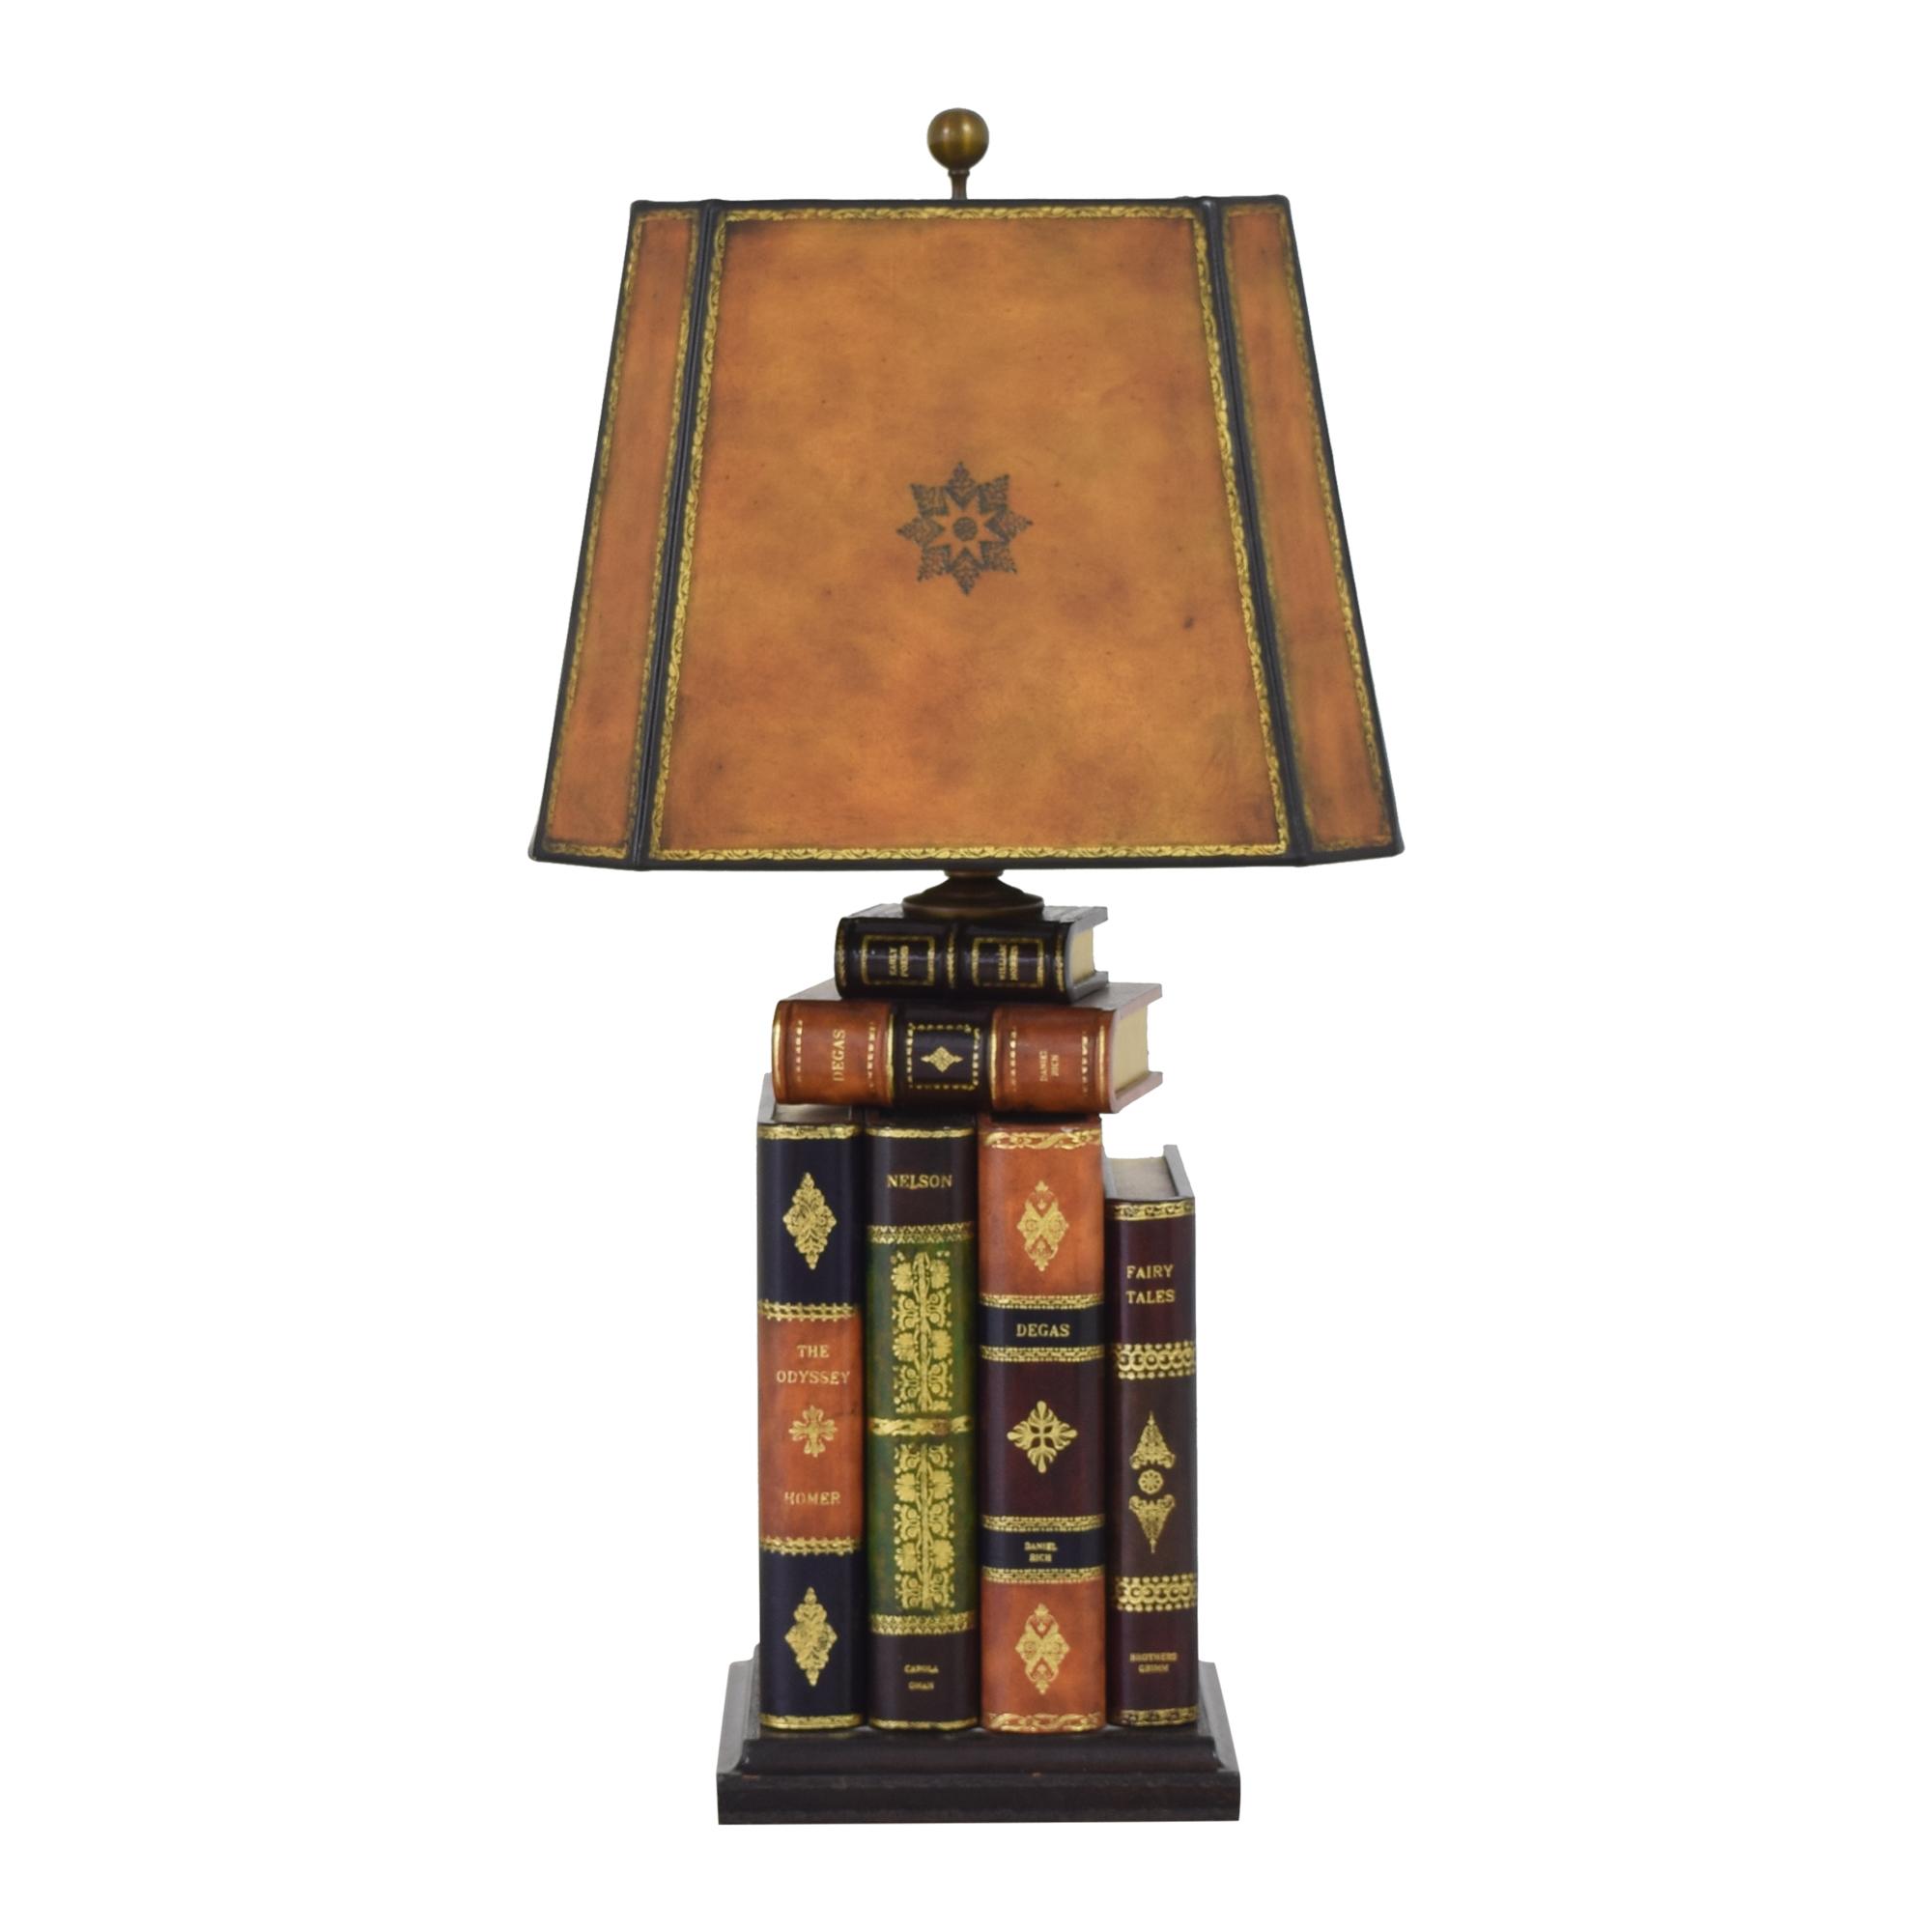 Maitland-Smith Maitland-Smith Library Table Lamp nj